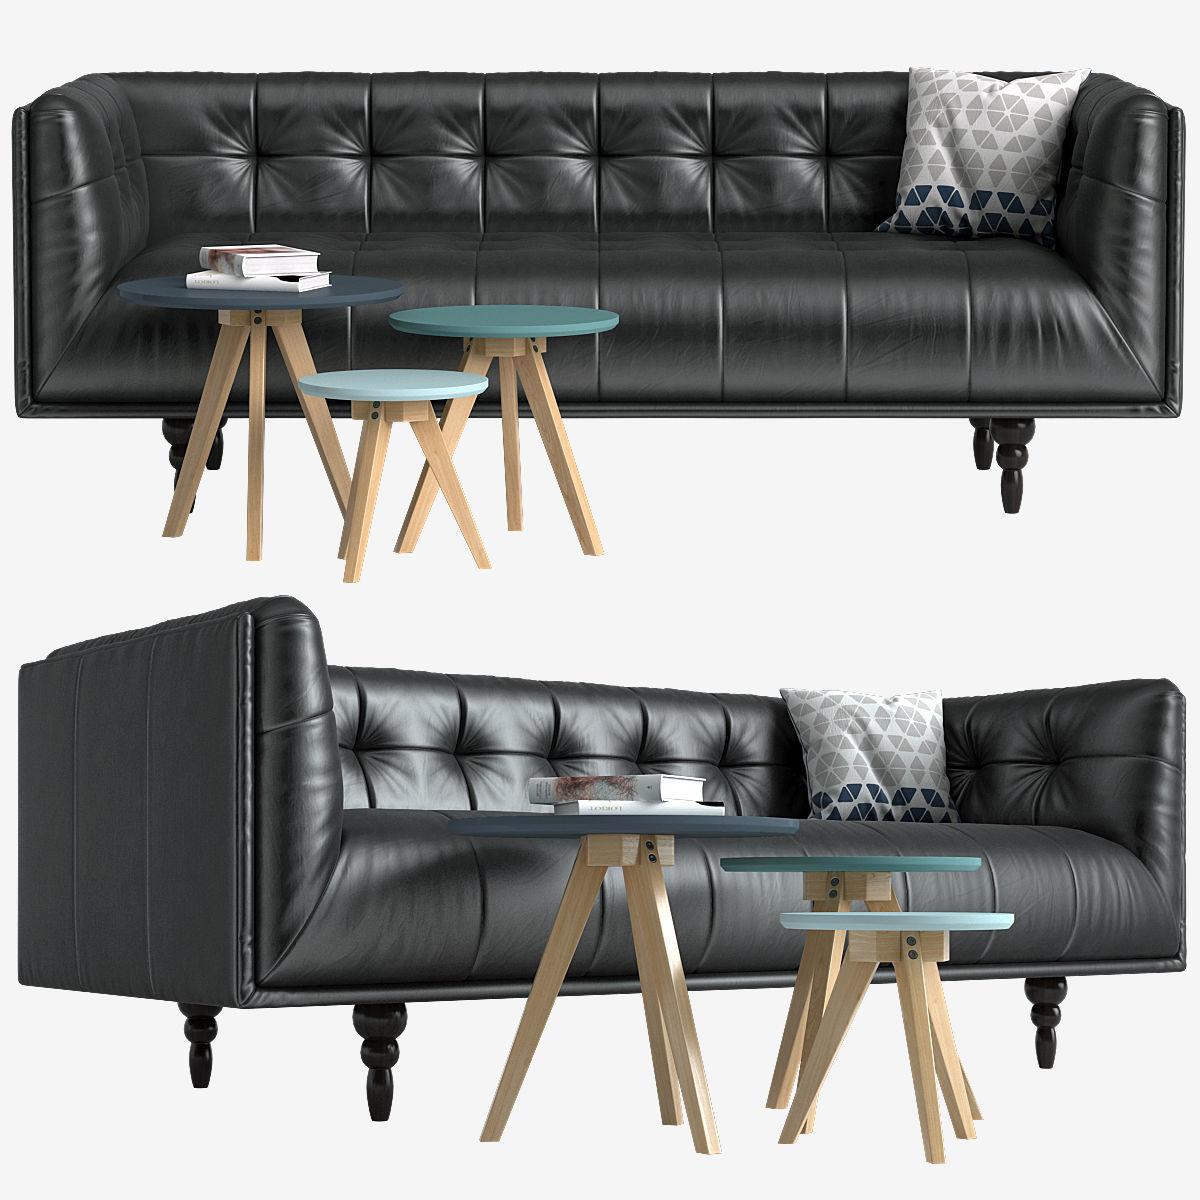 Sofa Made Connor Table Orion Model Max Obj Mtl 1